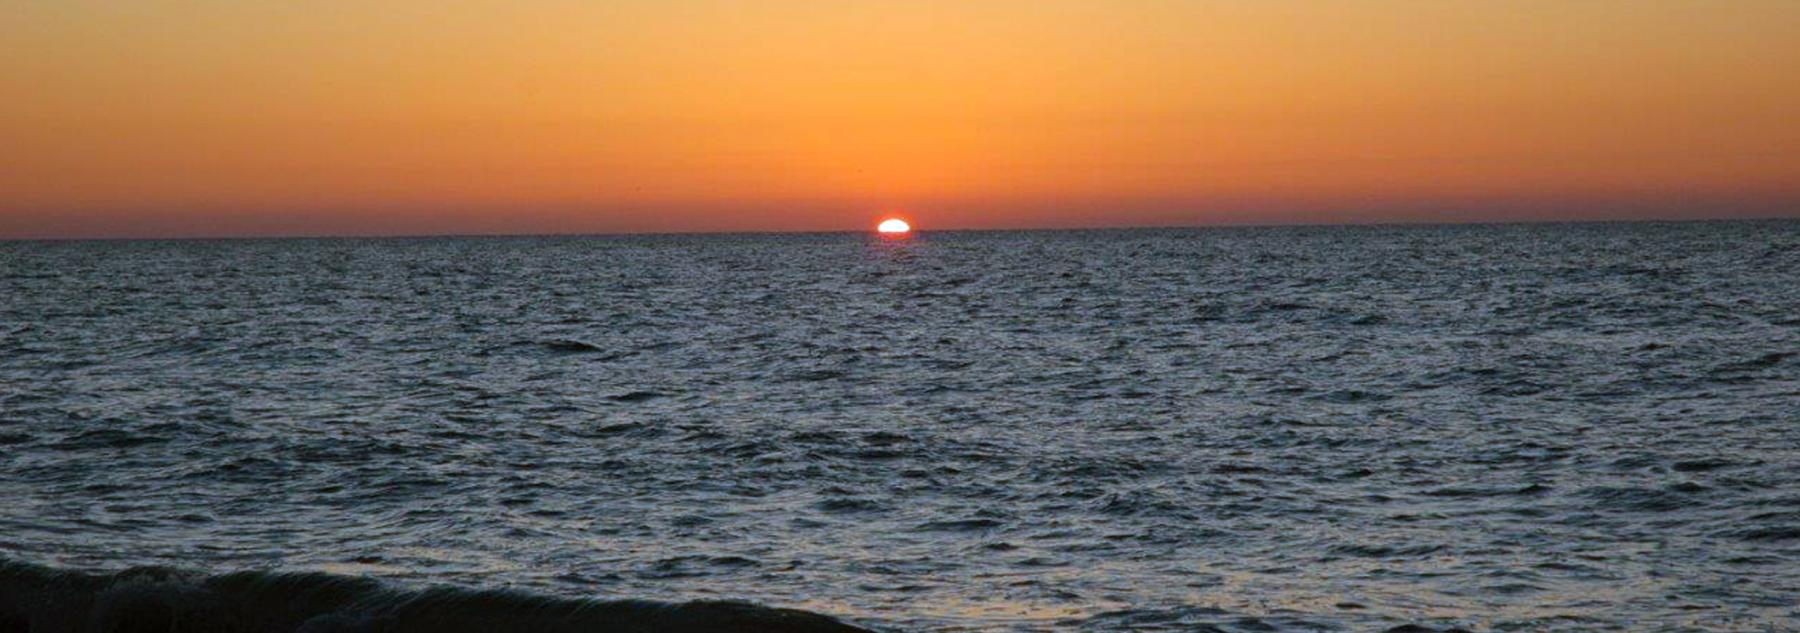 Beach Realty Sunset